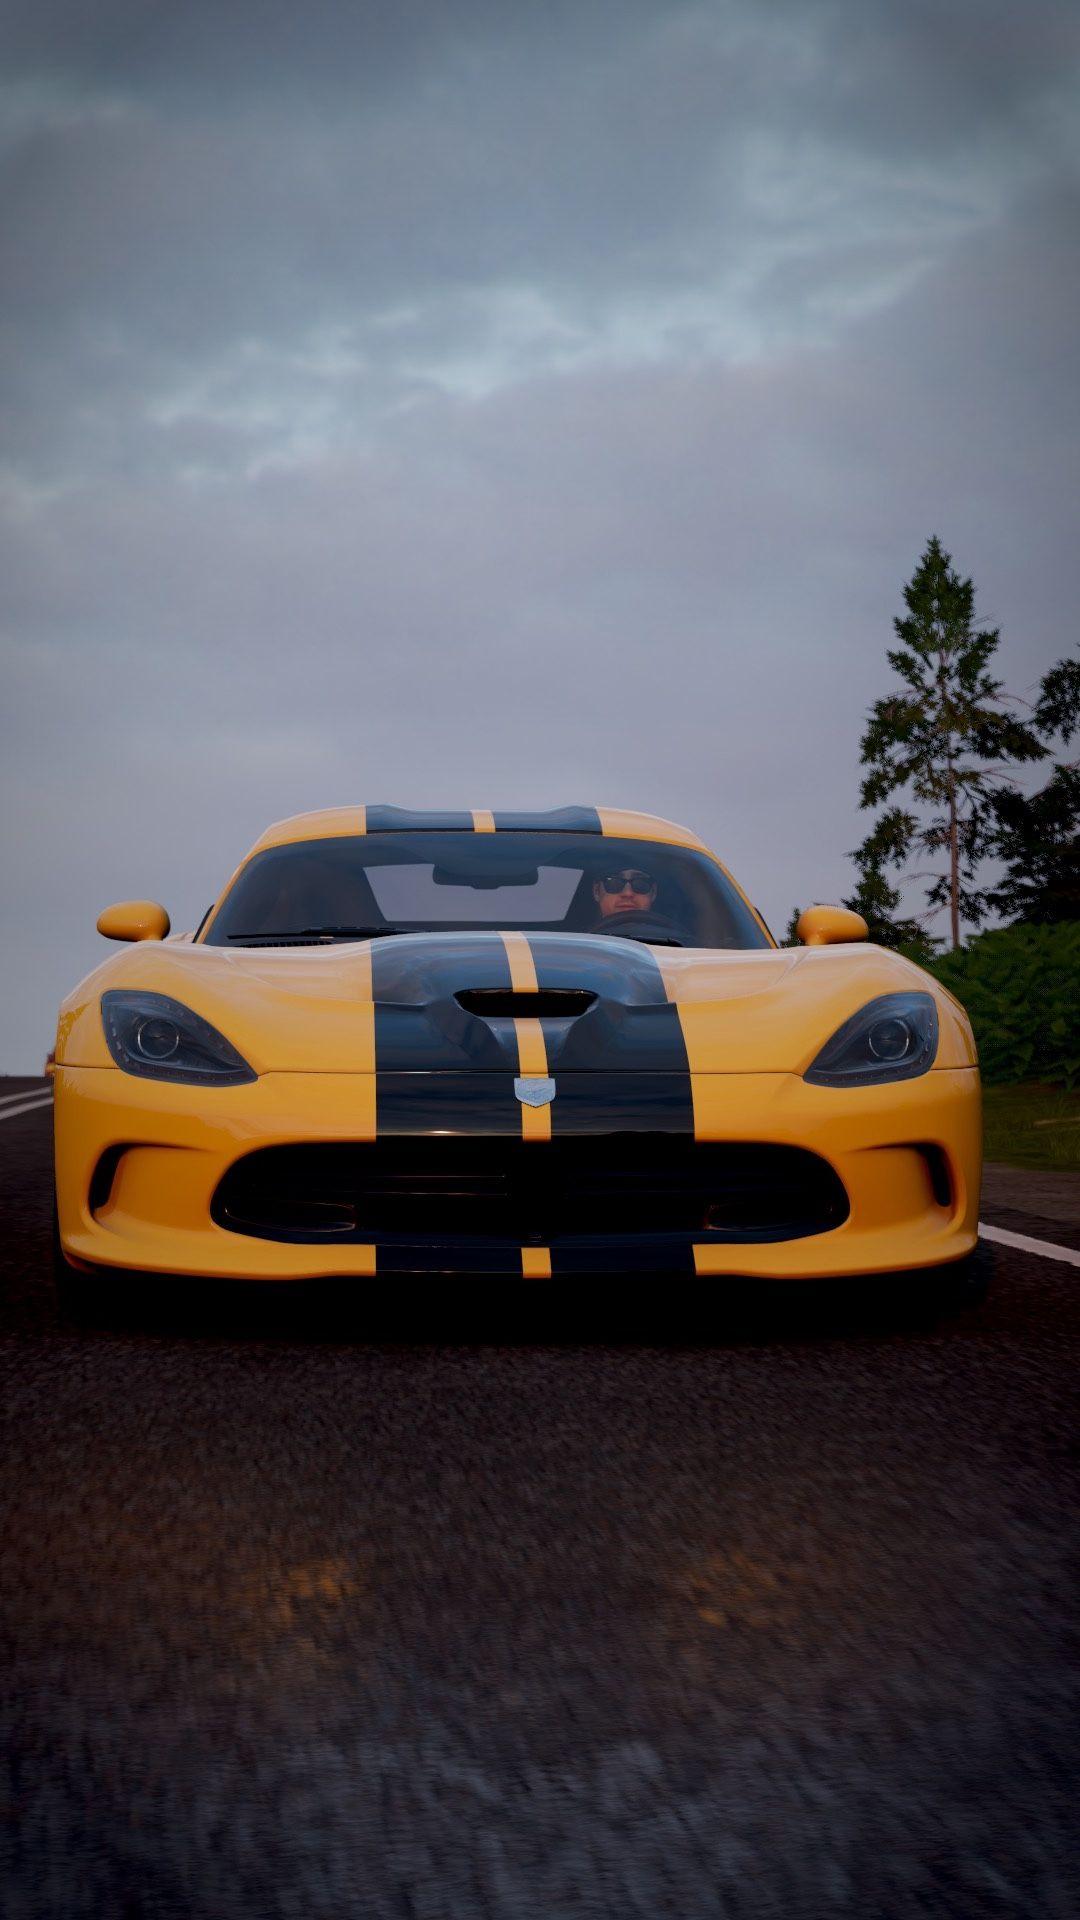 Dodge Viper Wallpaper Dodge Viper American Muscle Cars Super Cars